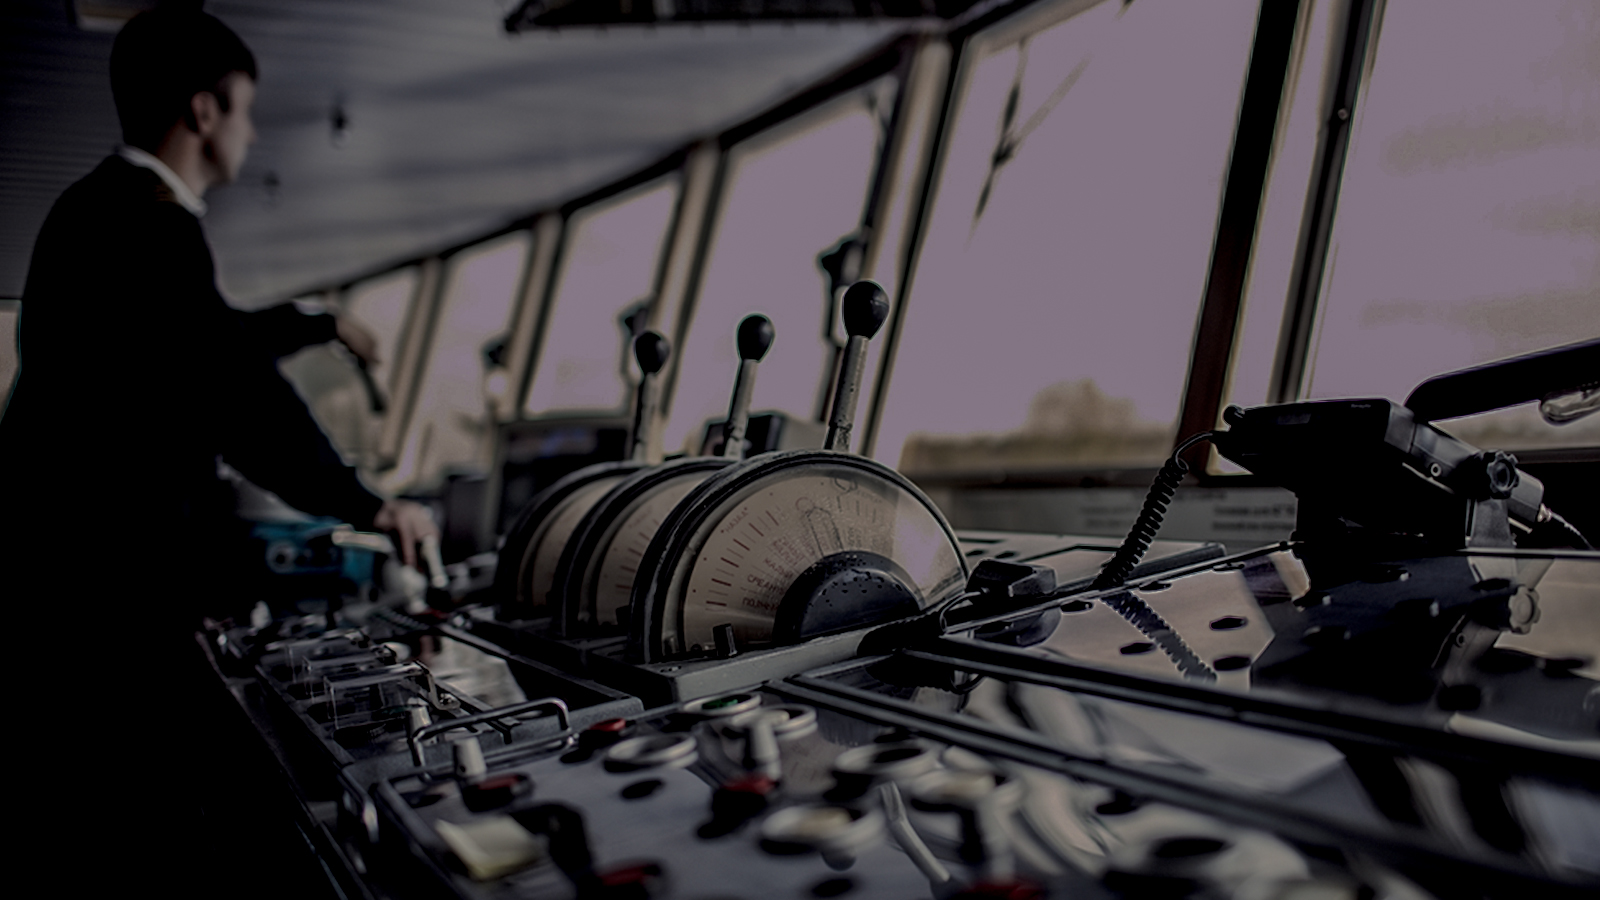 Vessel Personnel